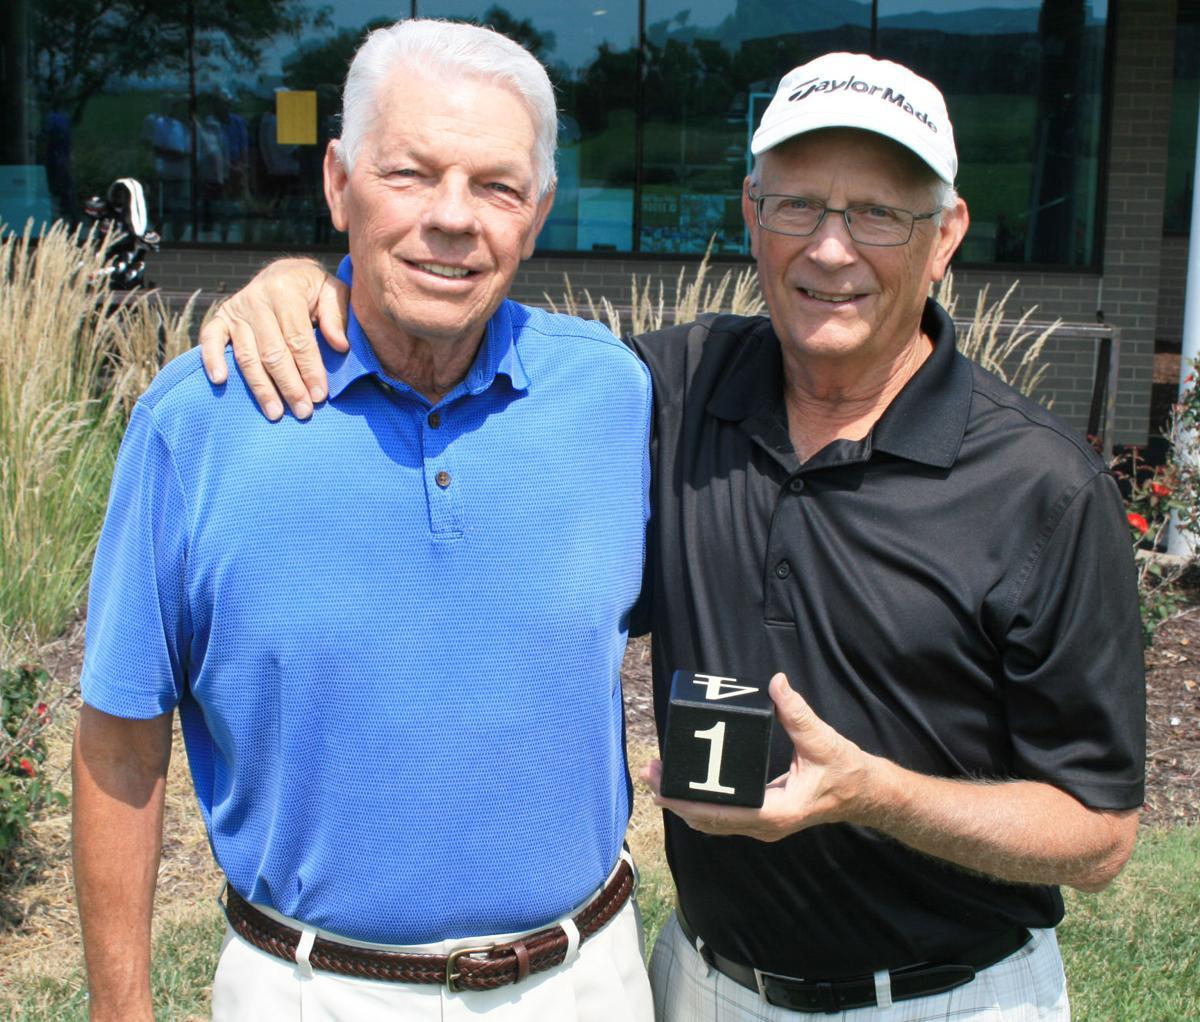 Highlands Div. 1 winners, Bob Brandt and Bob Danley